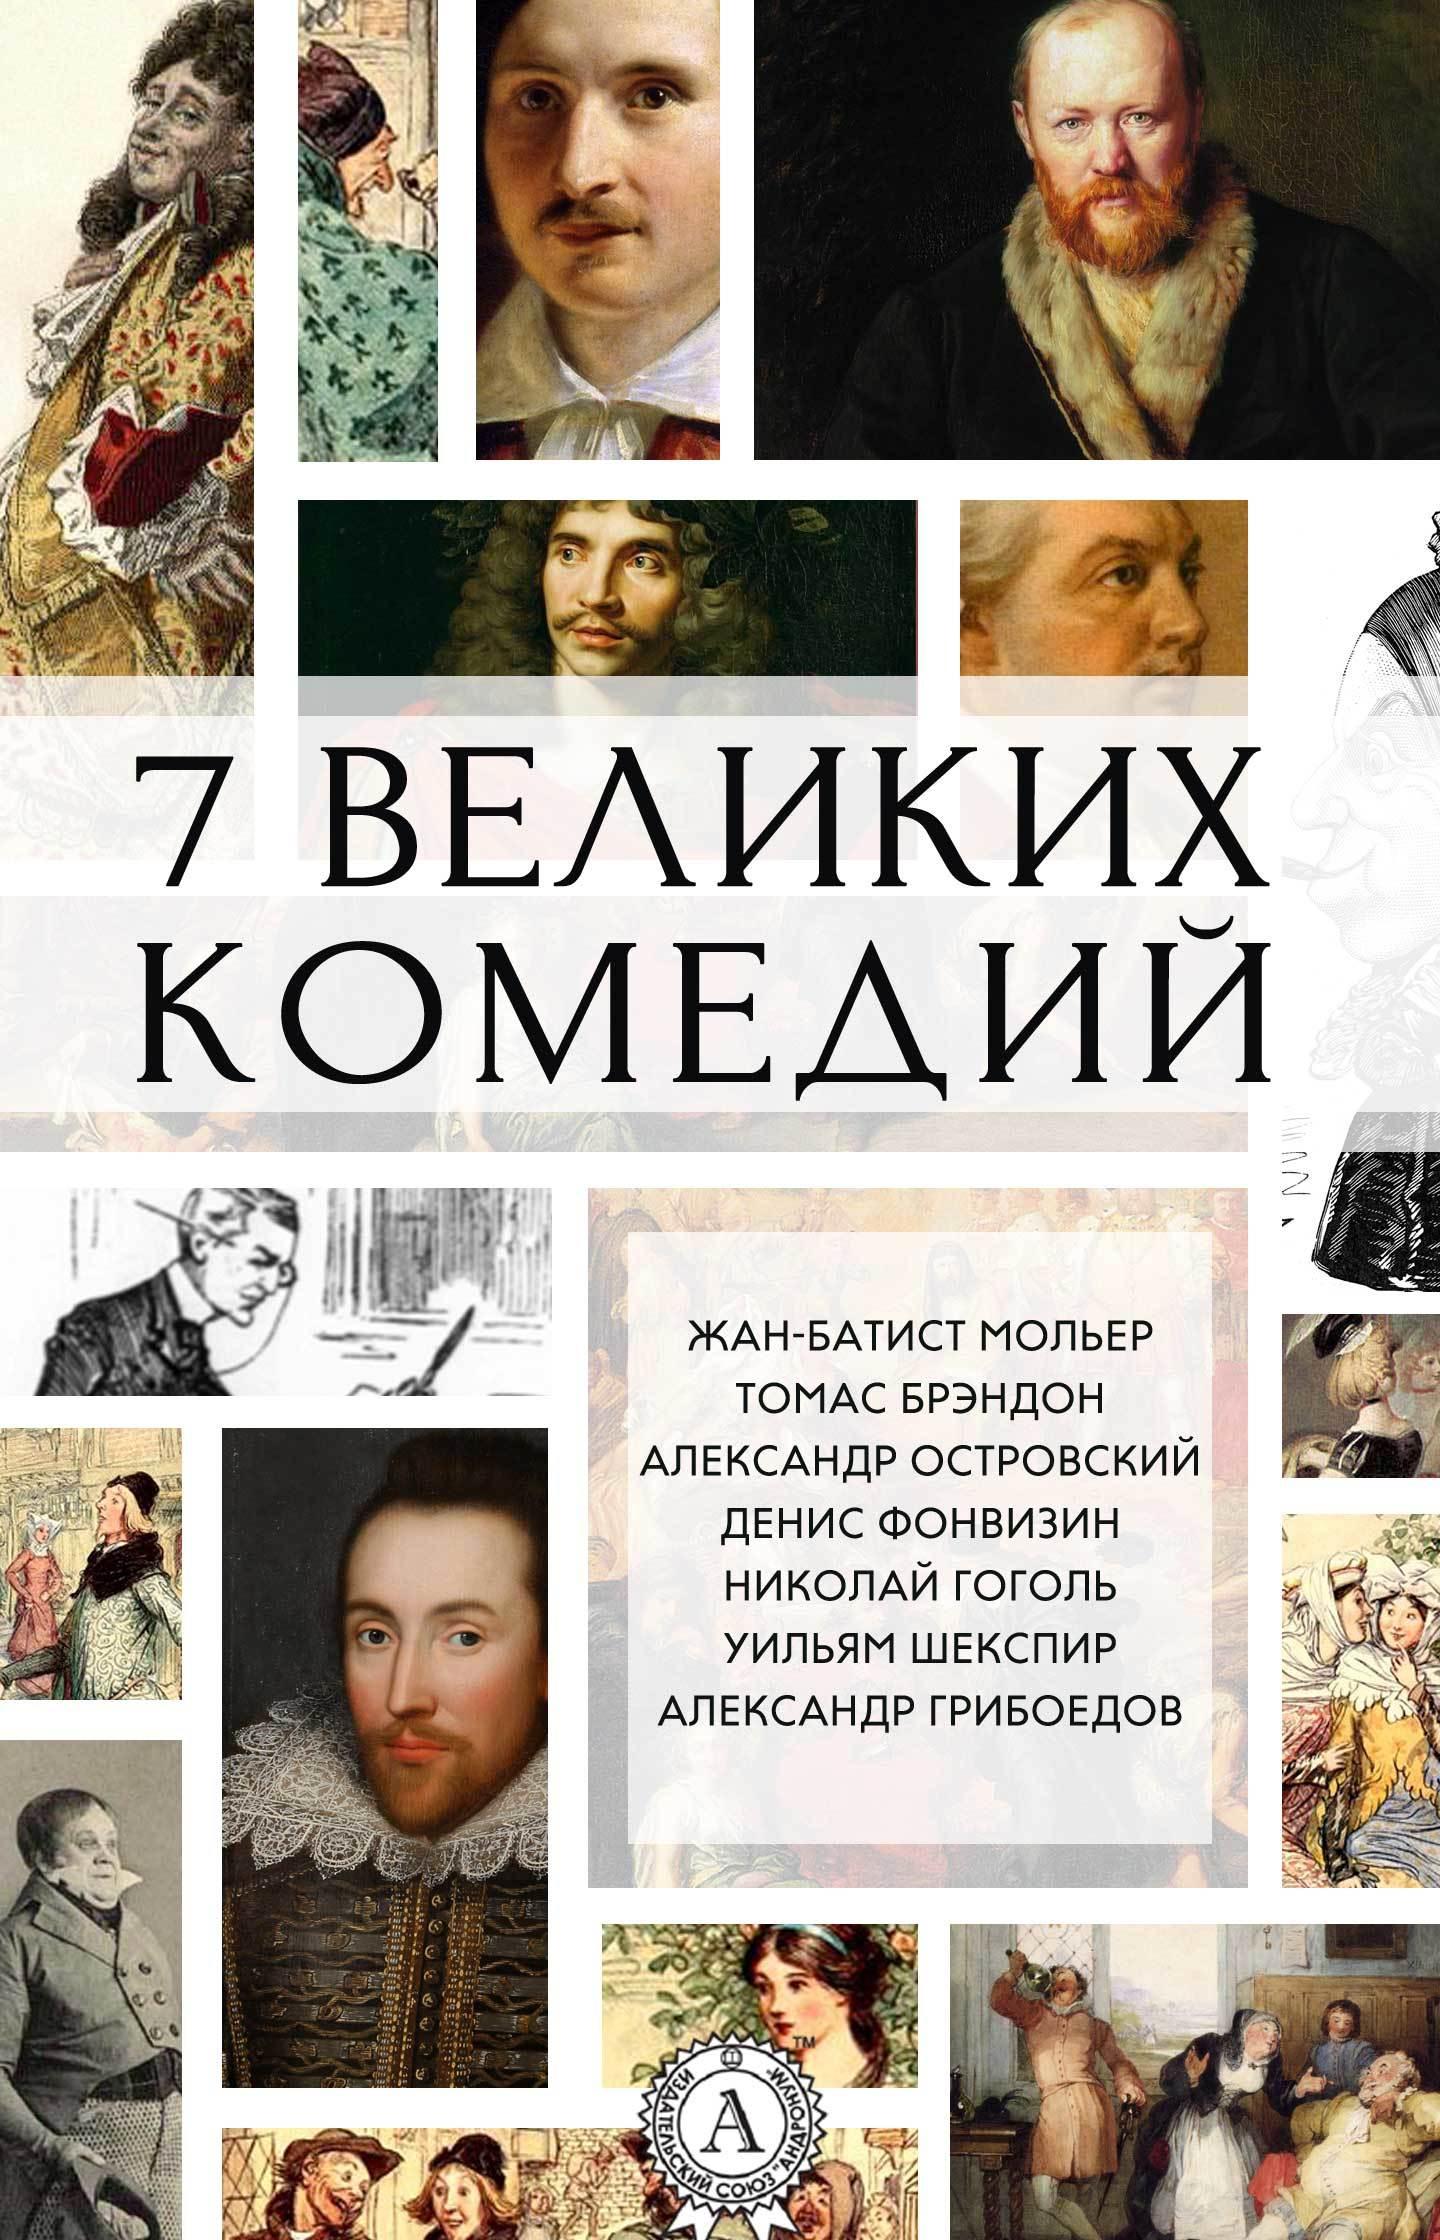 обложка книги static/bookimages/21/54/53/21545368.bin.dir/21545368.cover.jpg